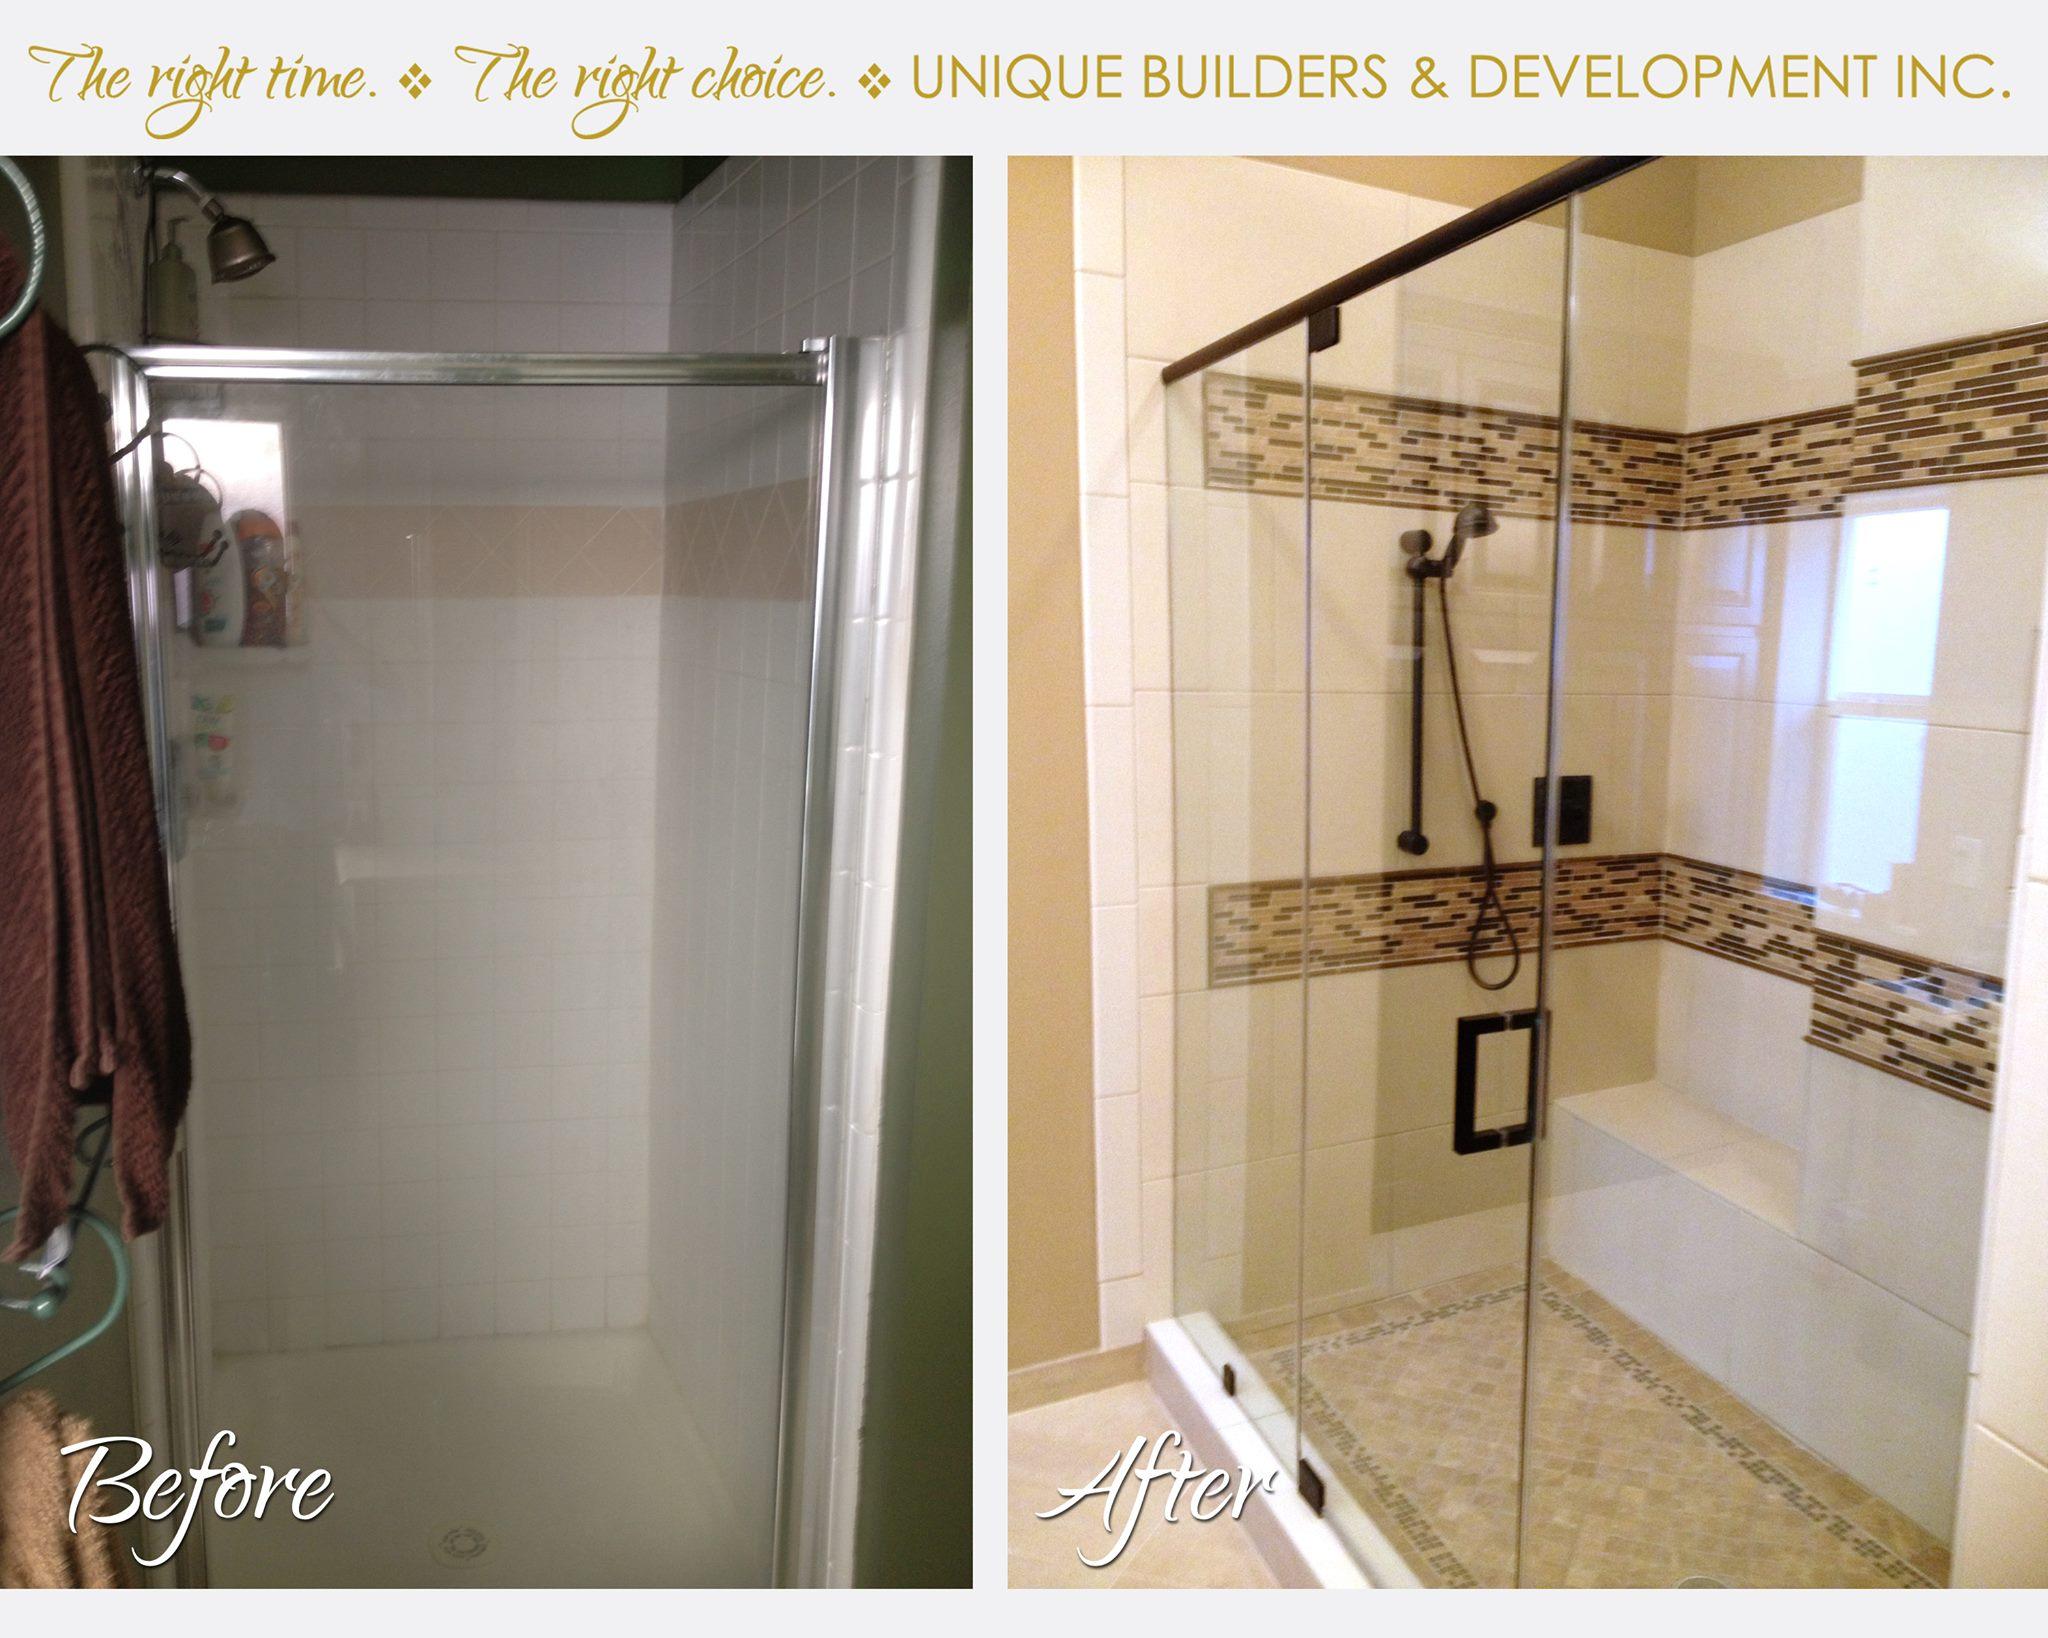 Before and After Bathroom Remodel Houston - UniqueBuildersTexas